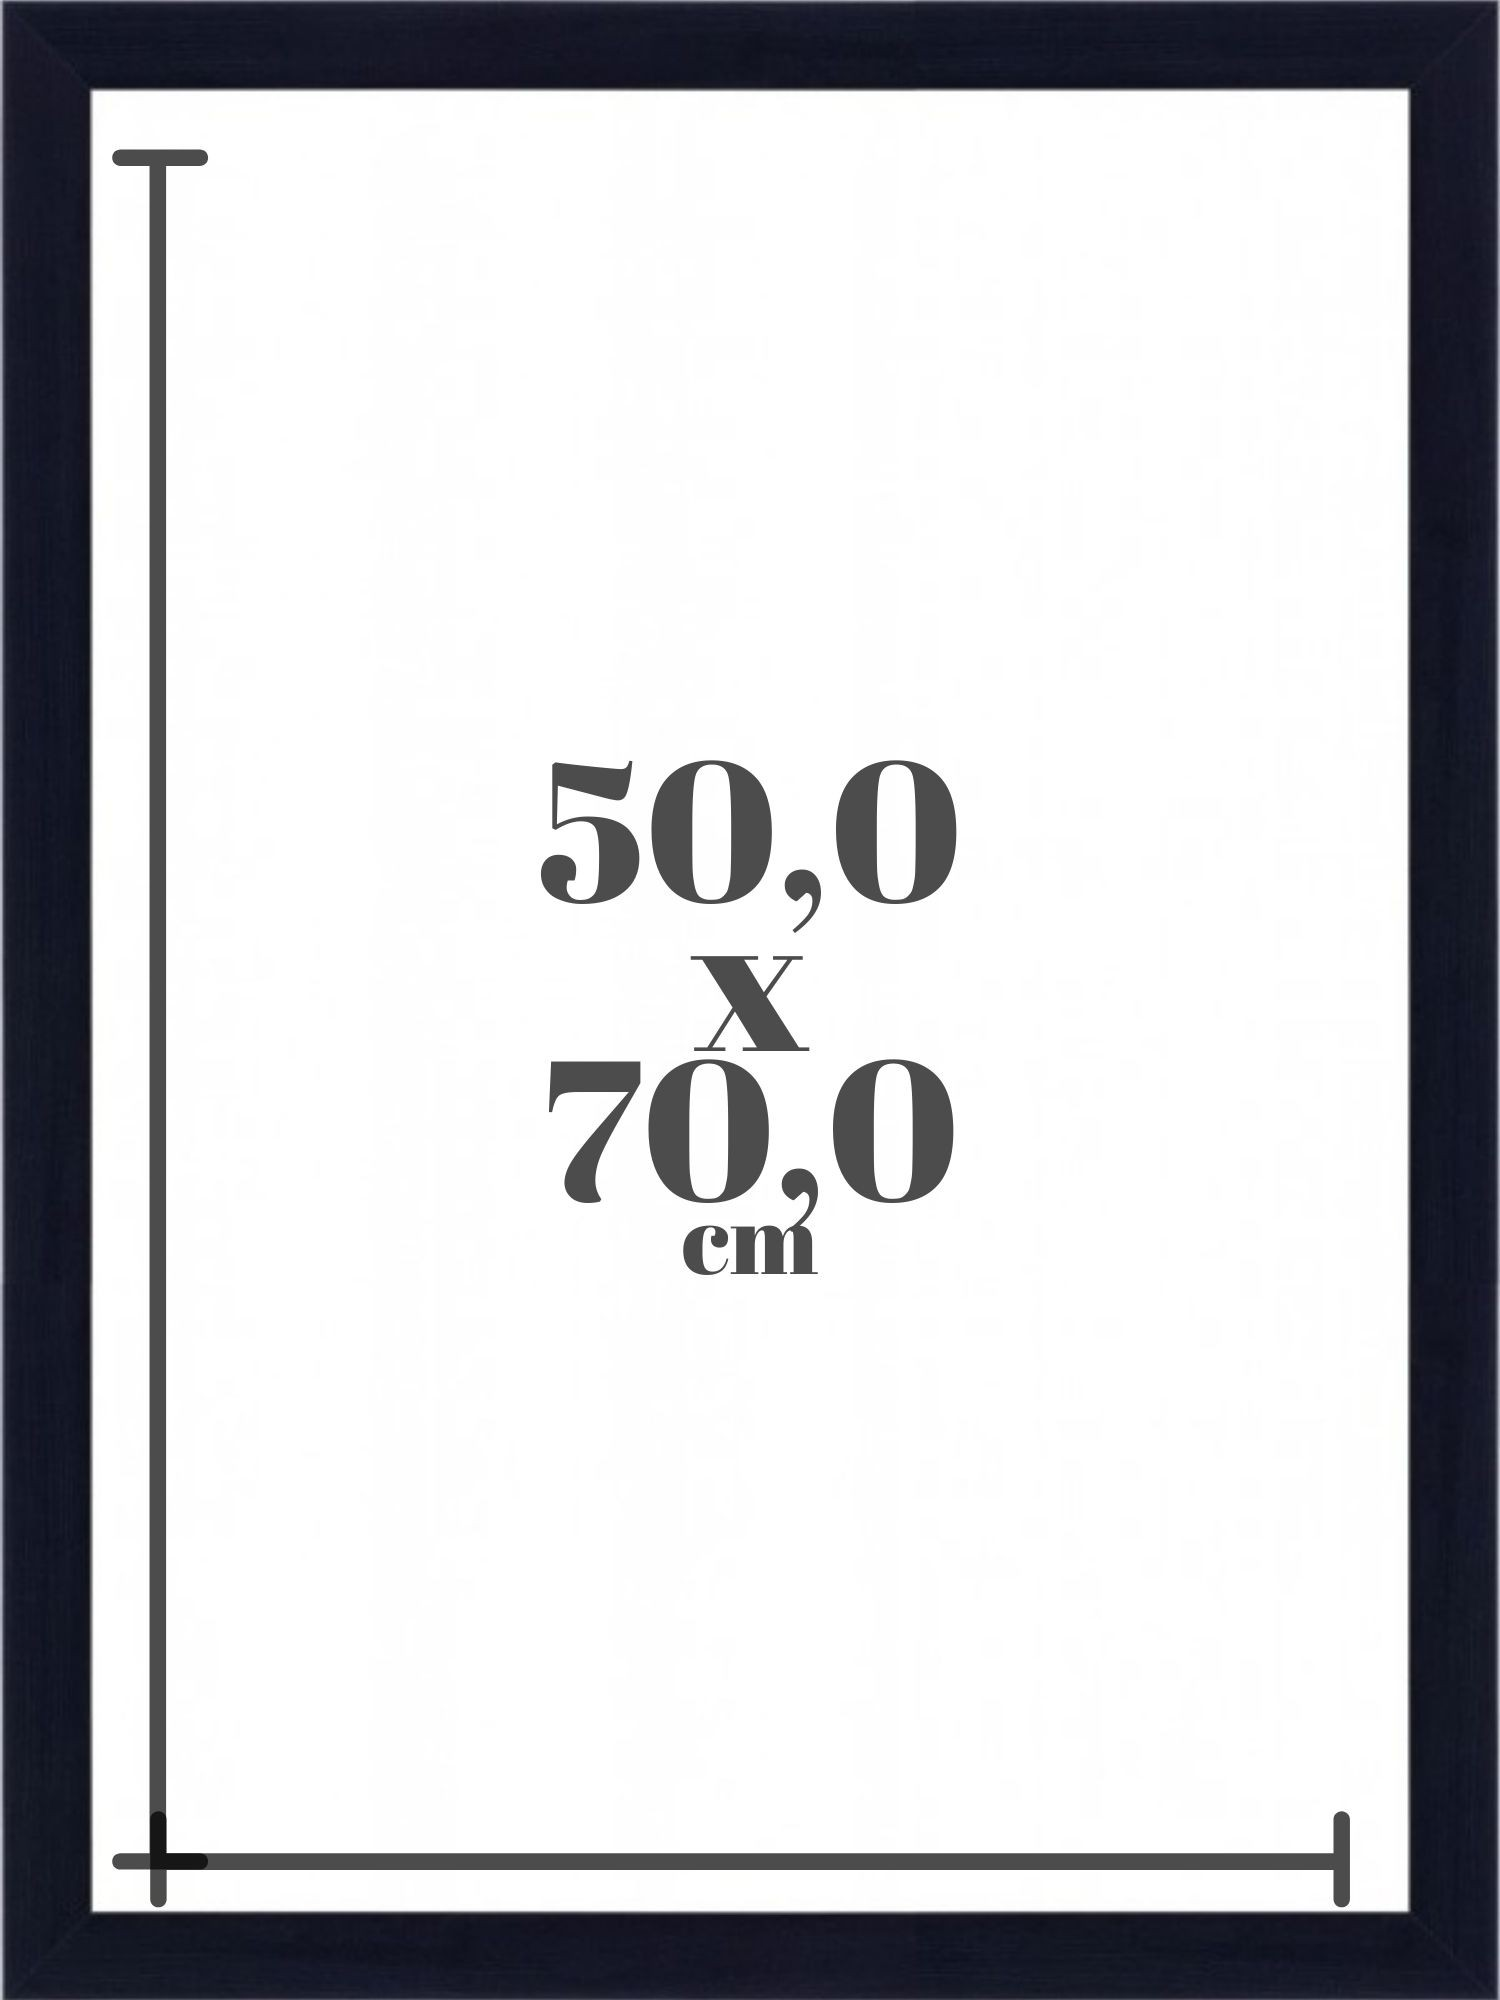 Moldura 50x70 cm